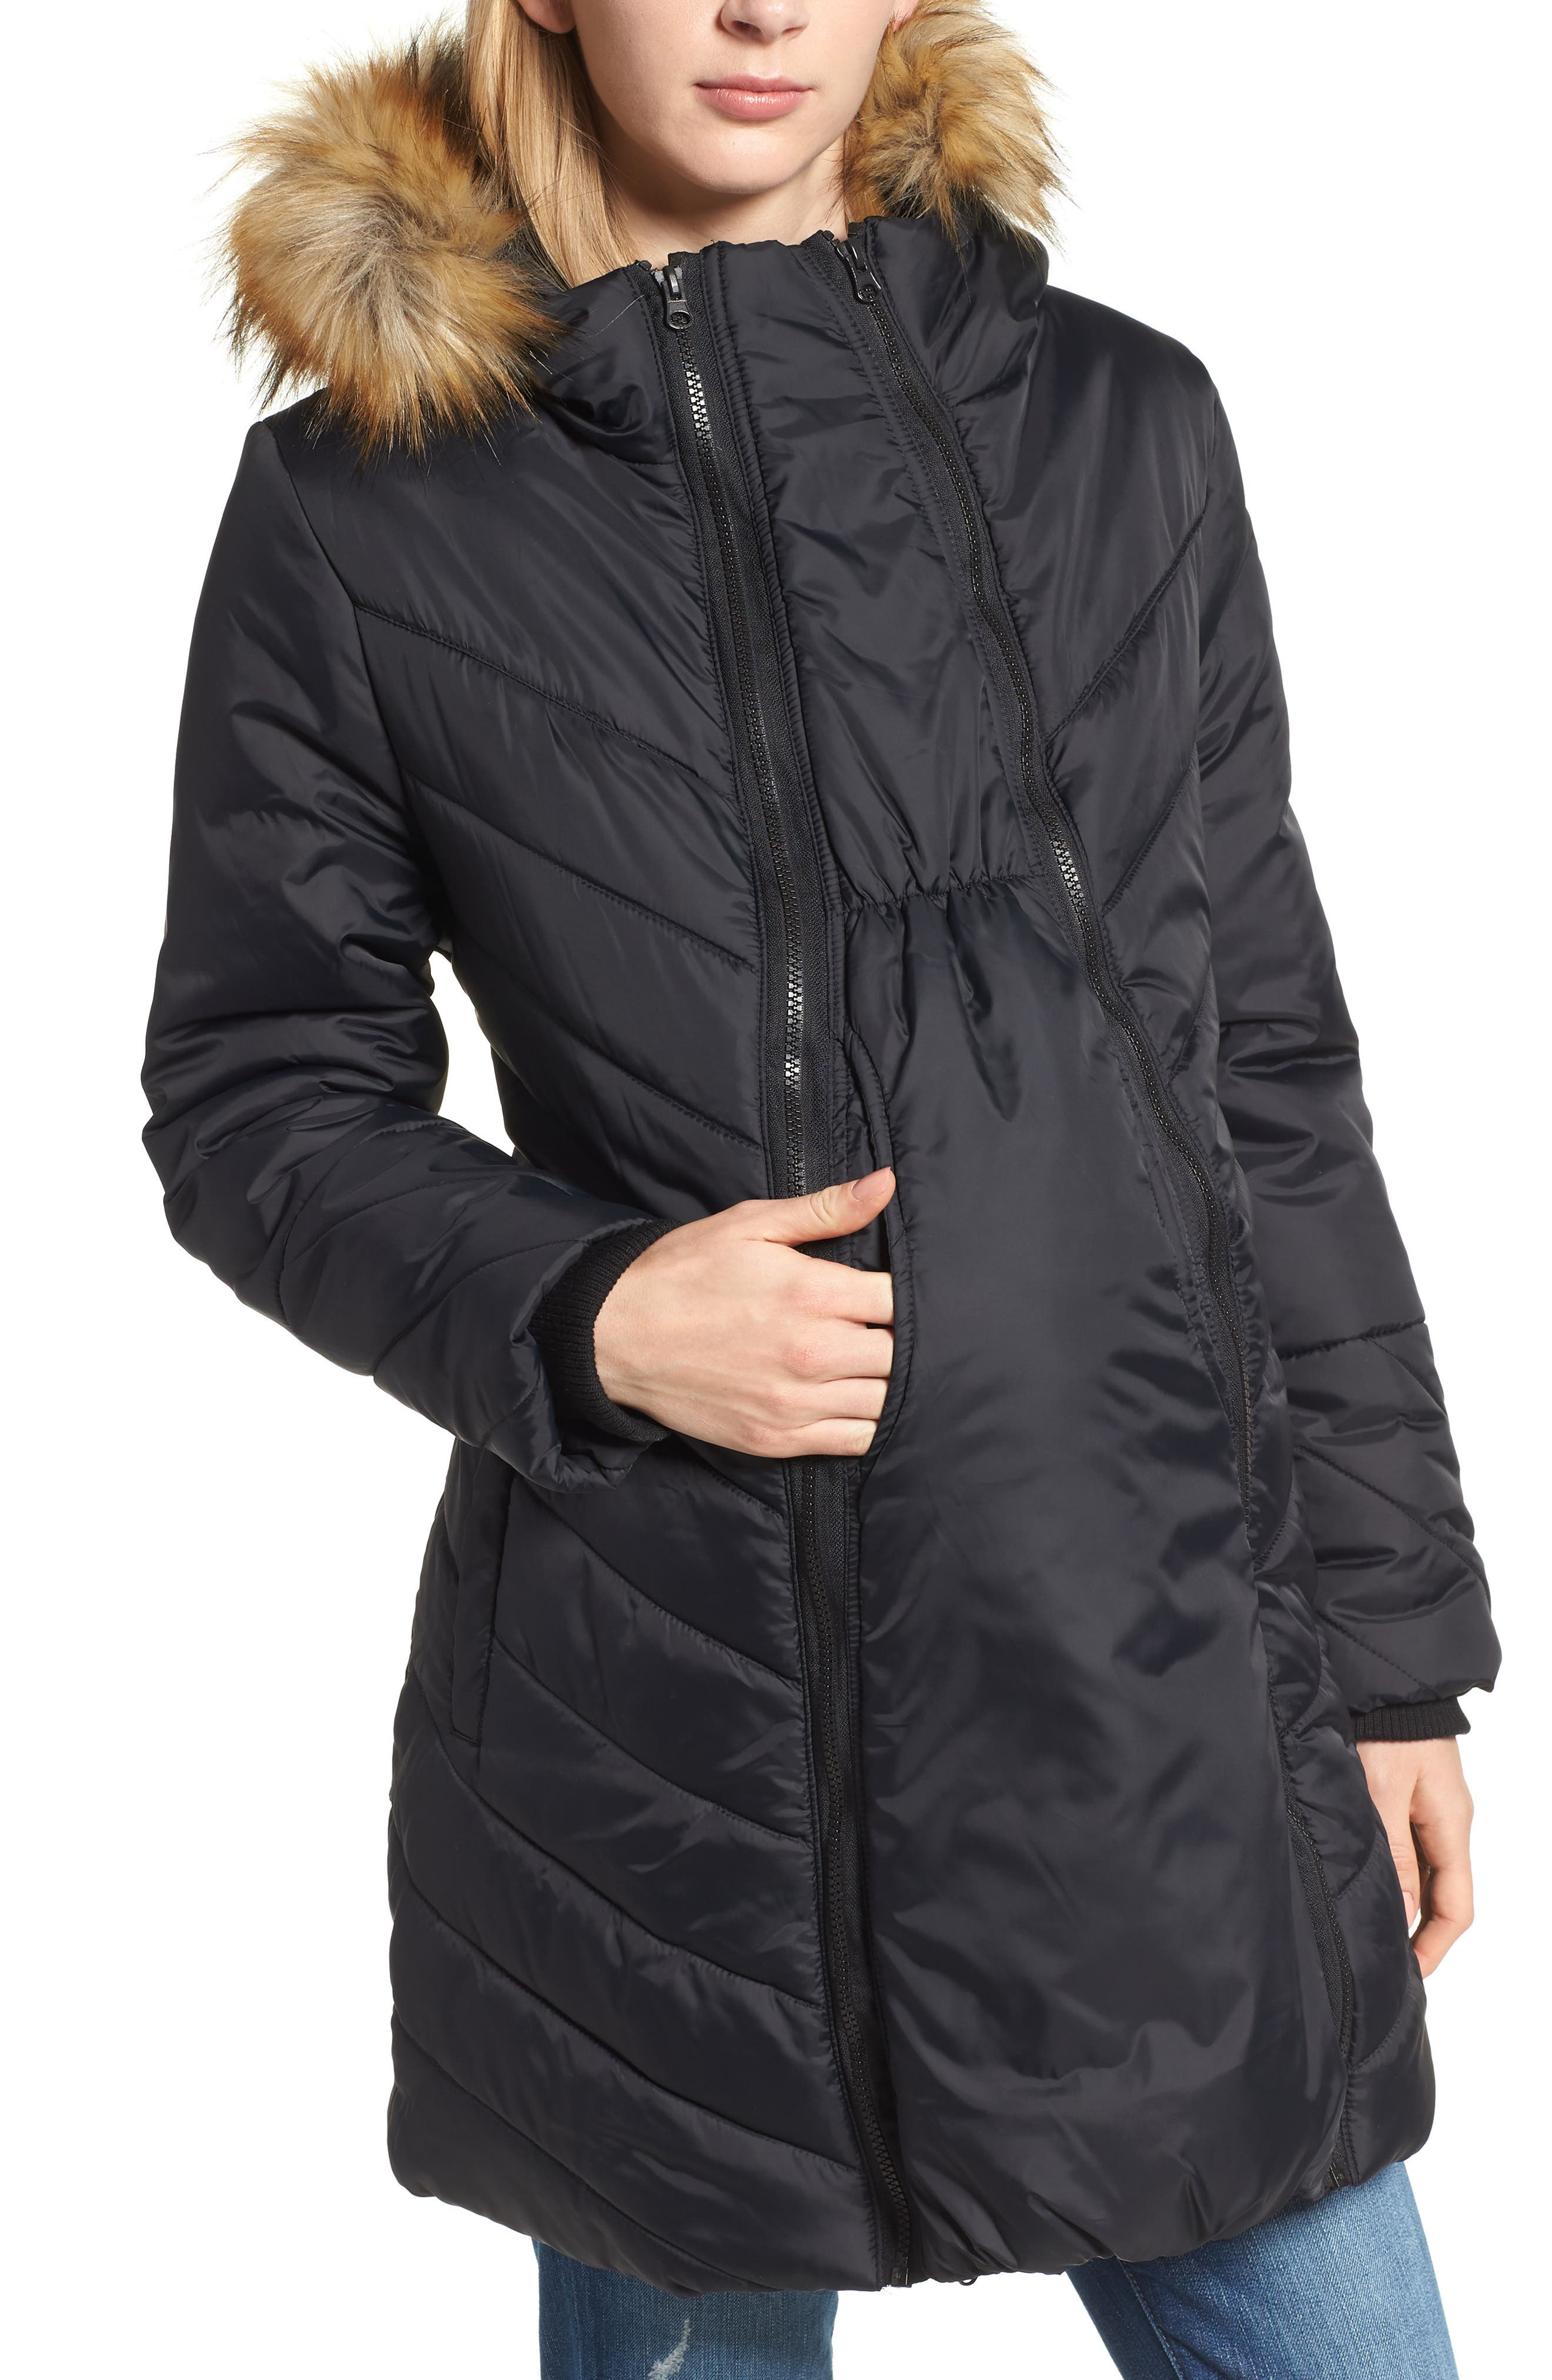 Alternate Image 1 Selected - Modern Eternity Faux Fur Convertible Puffer Maternity Jacket